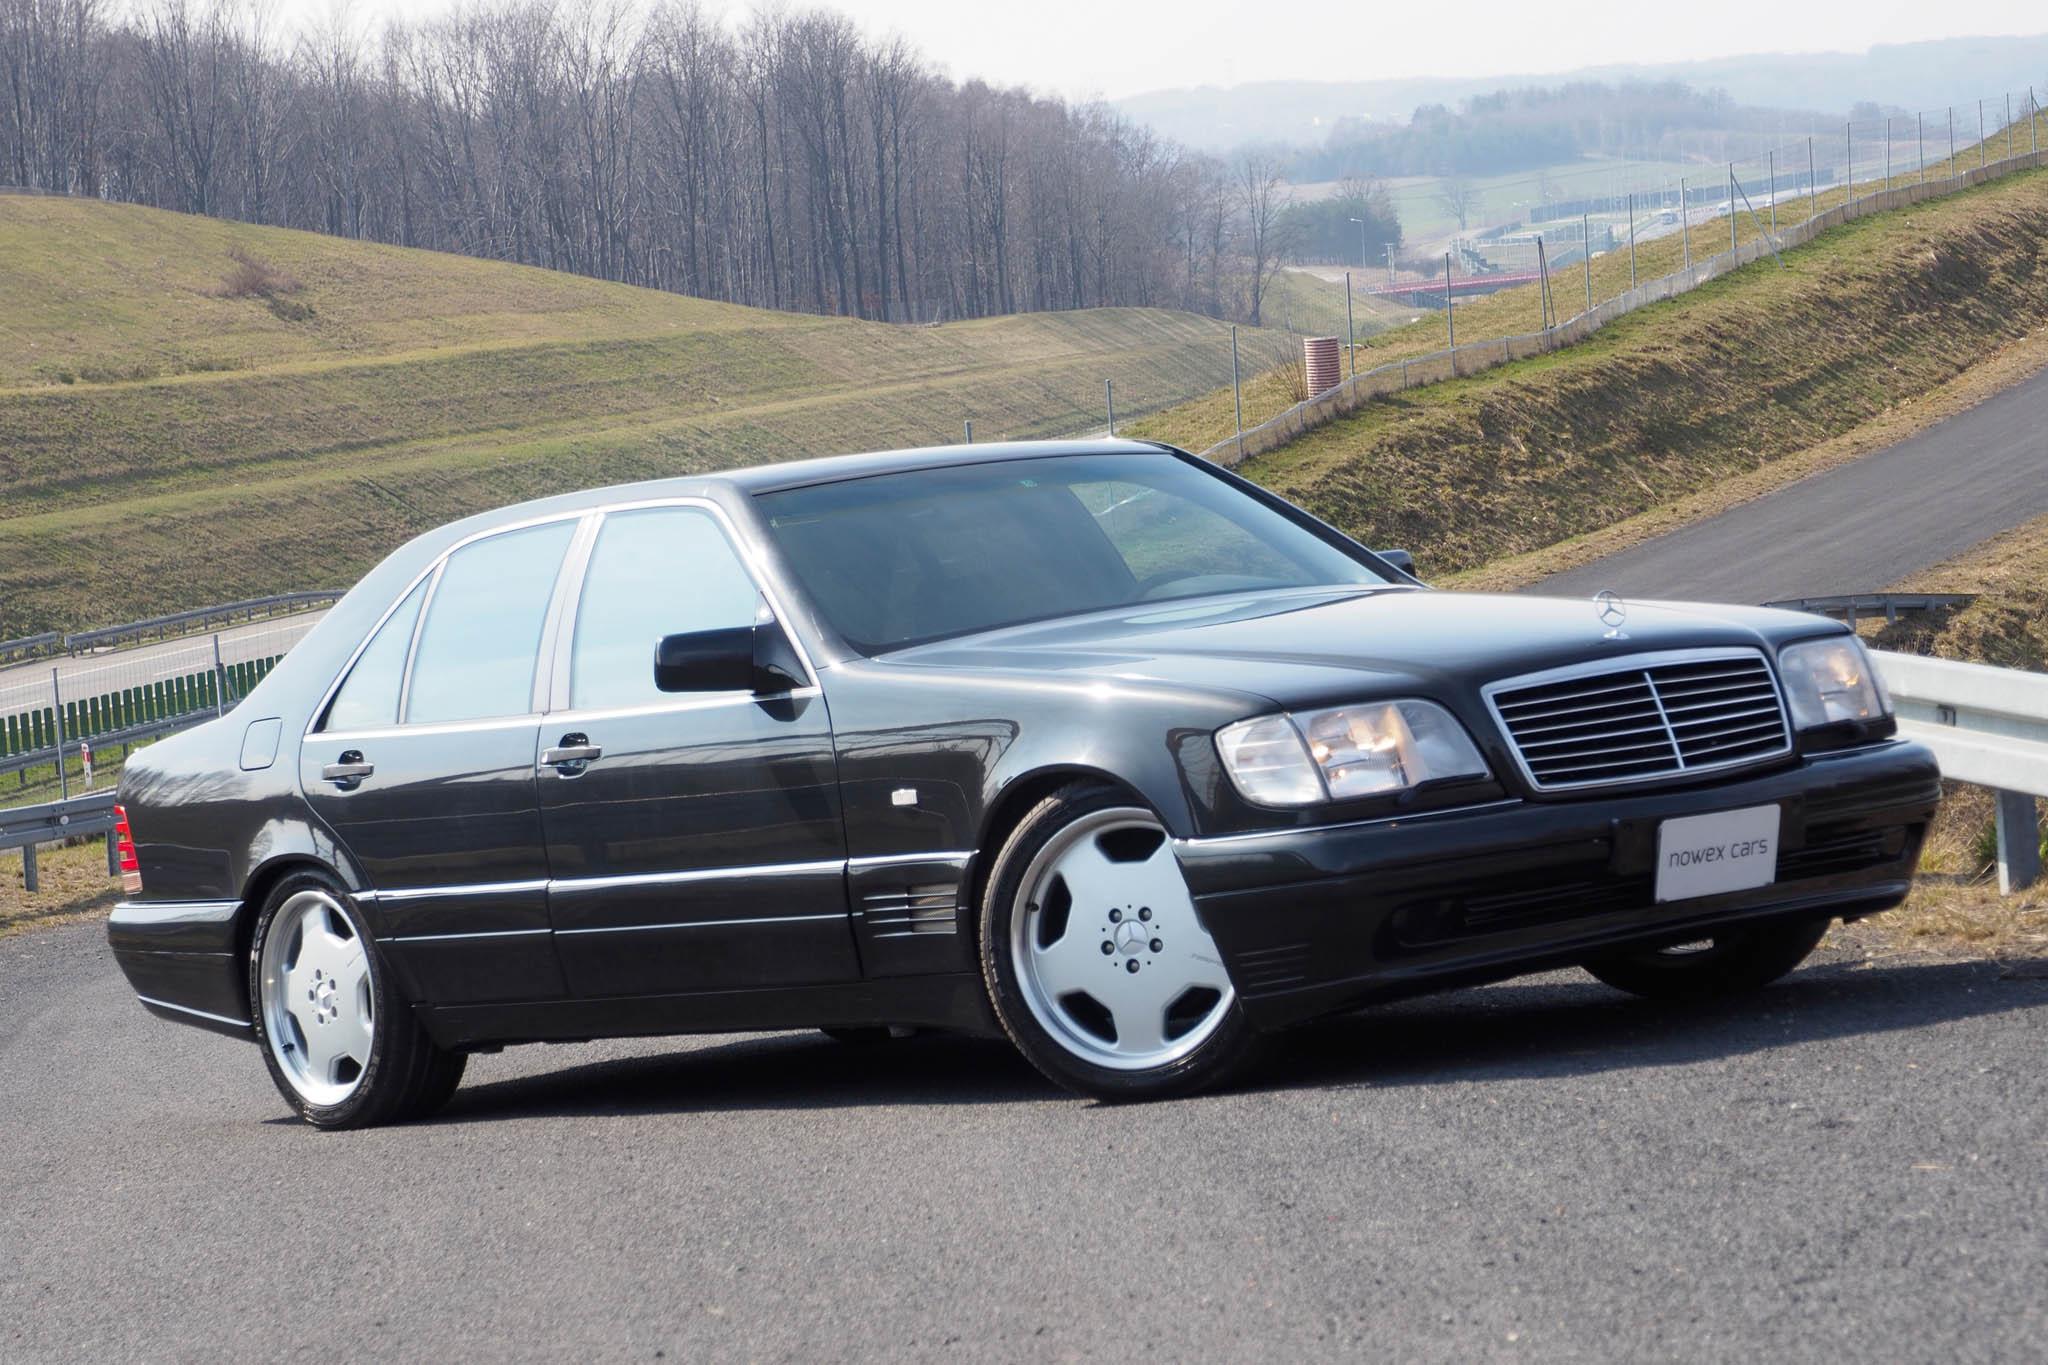 92 mercedes benz 300 se nowex cars for Mercedes benz 300 se